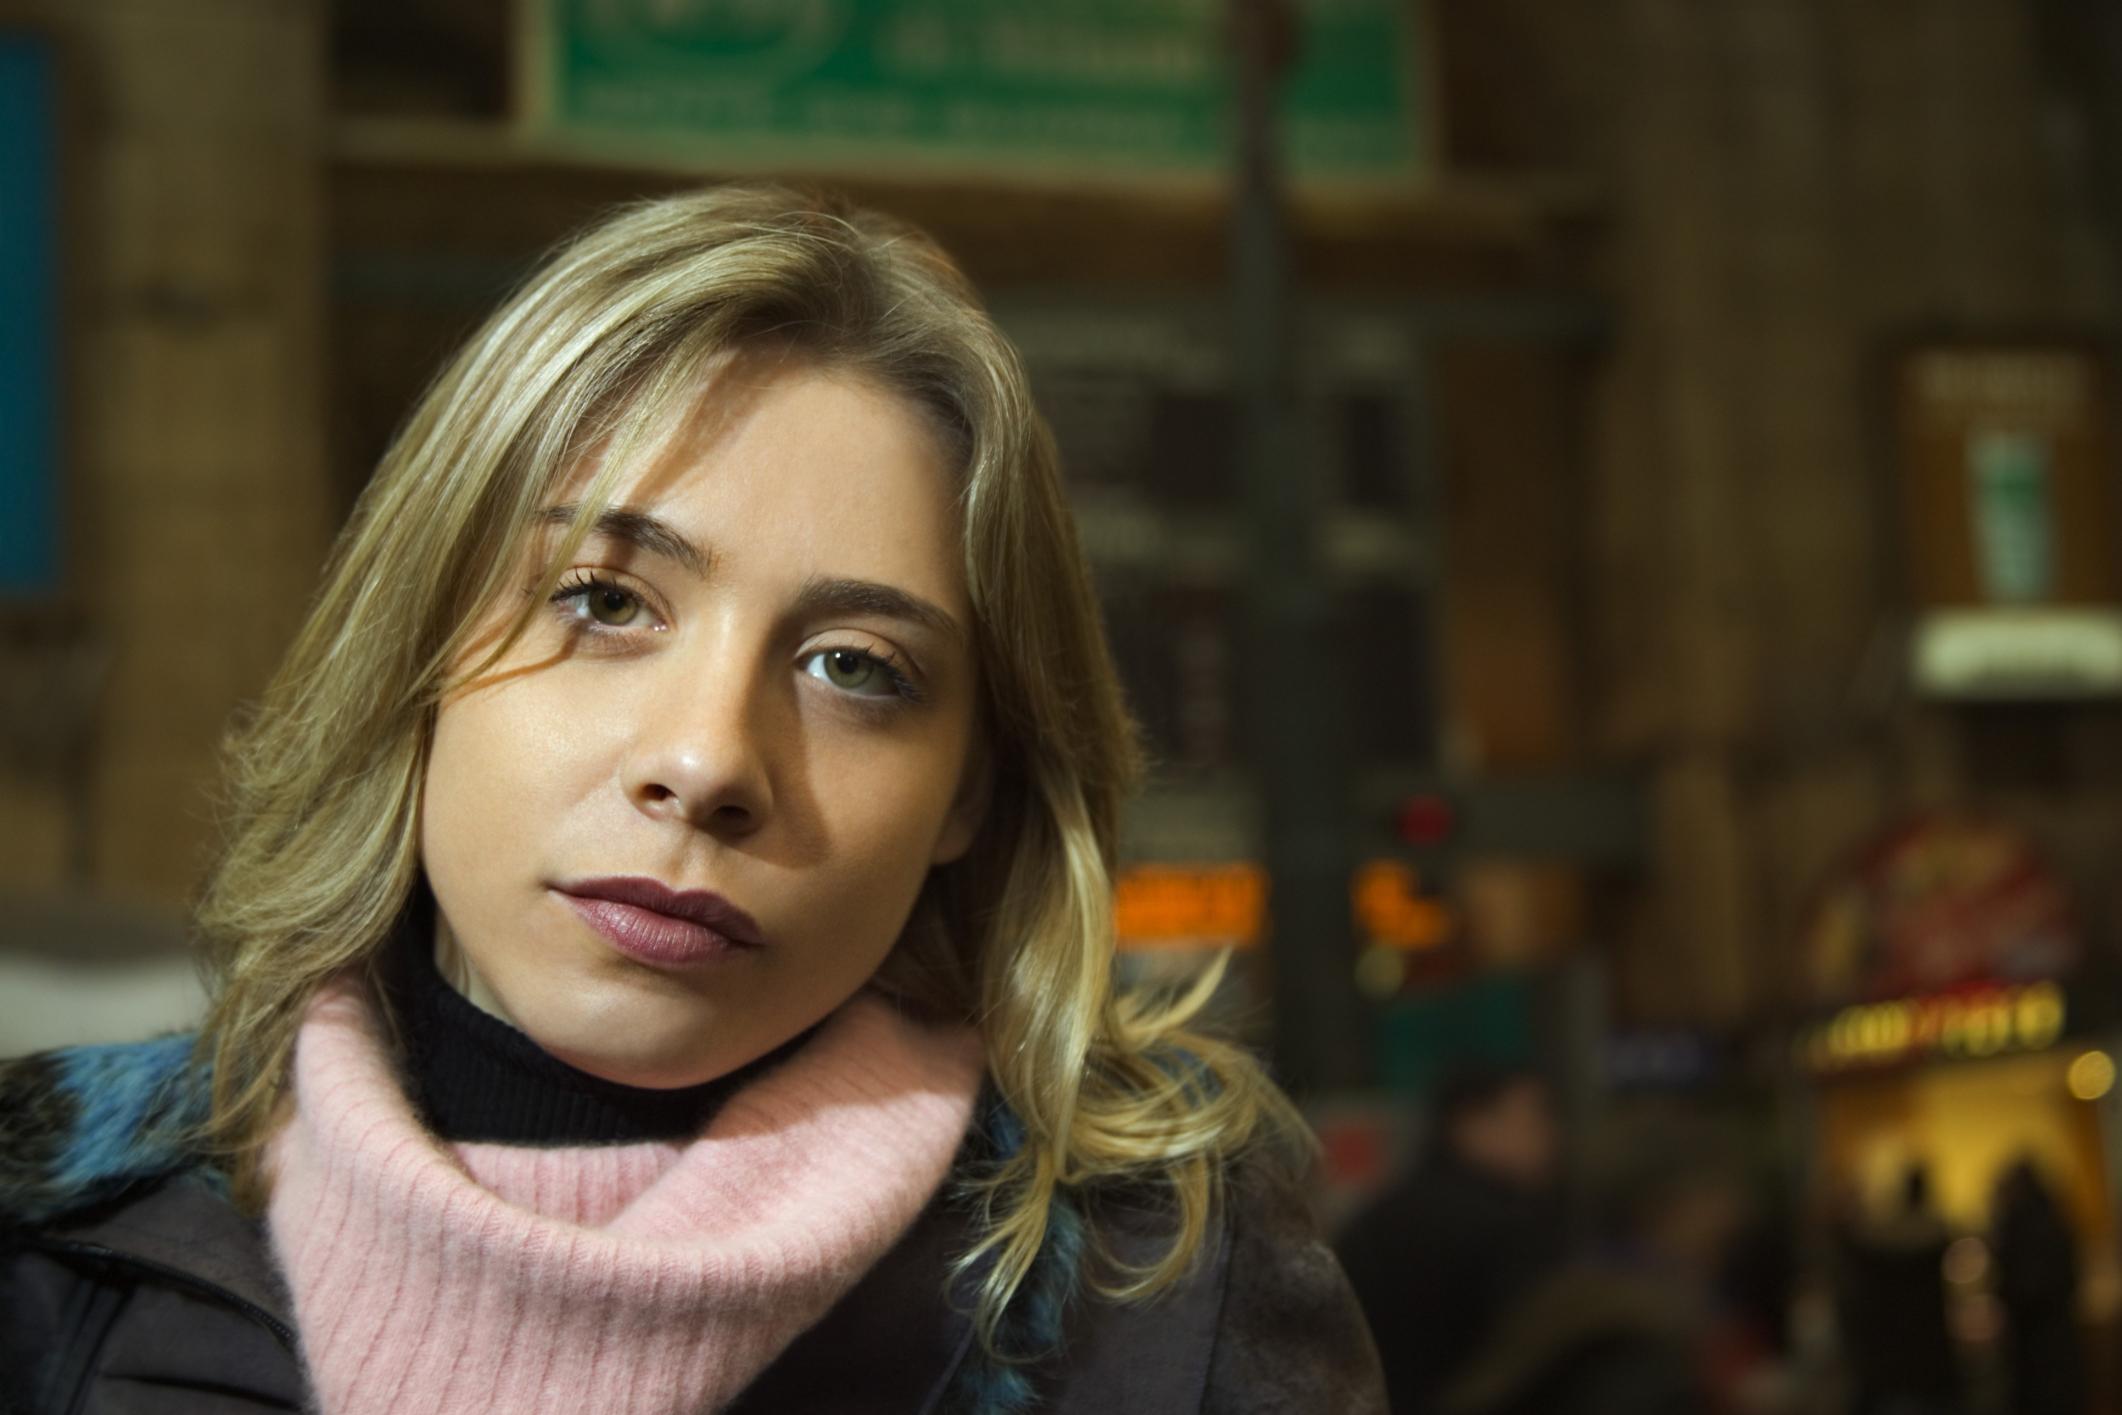 Signs of Low Self-Esteem in Women